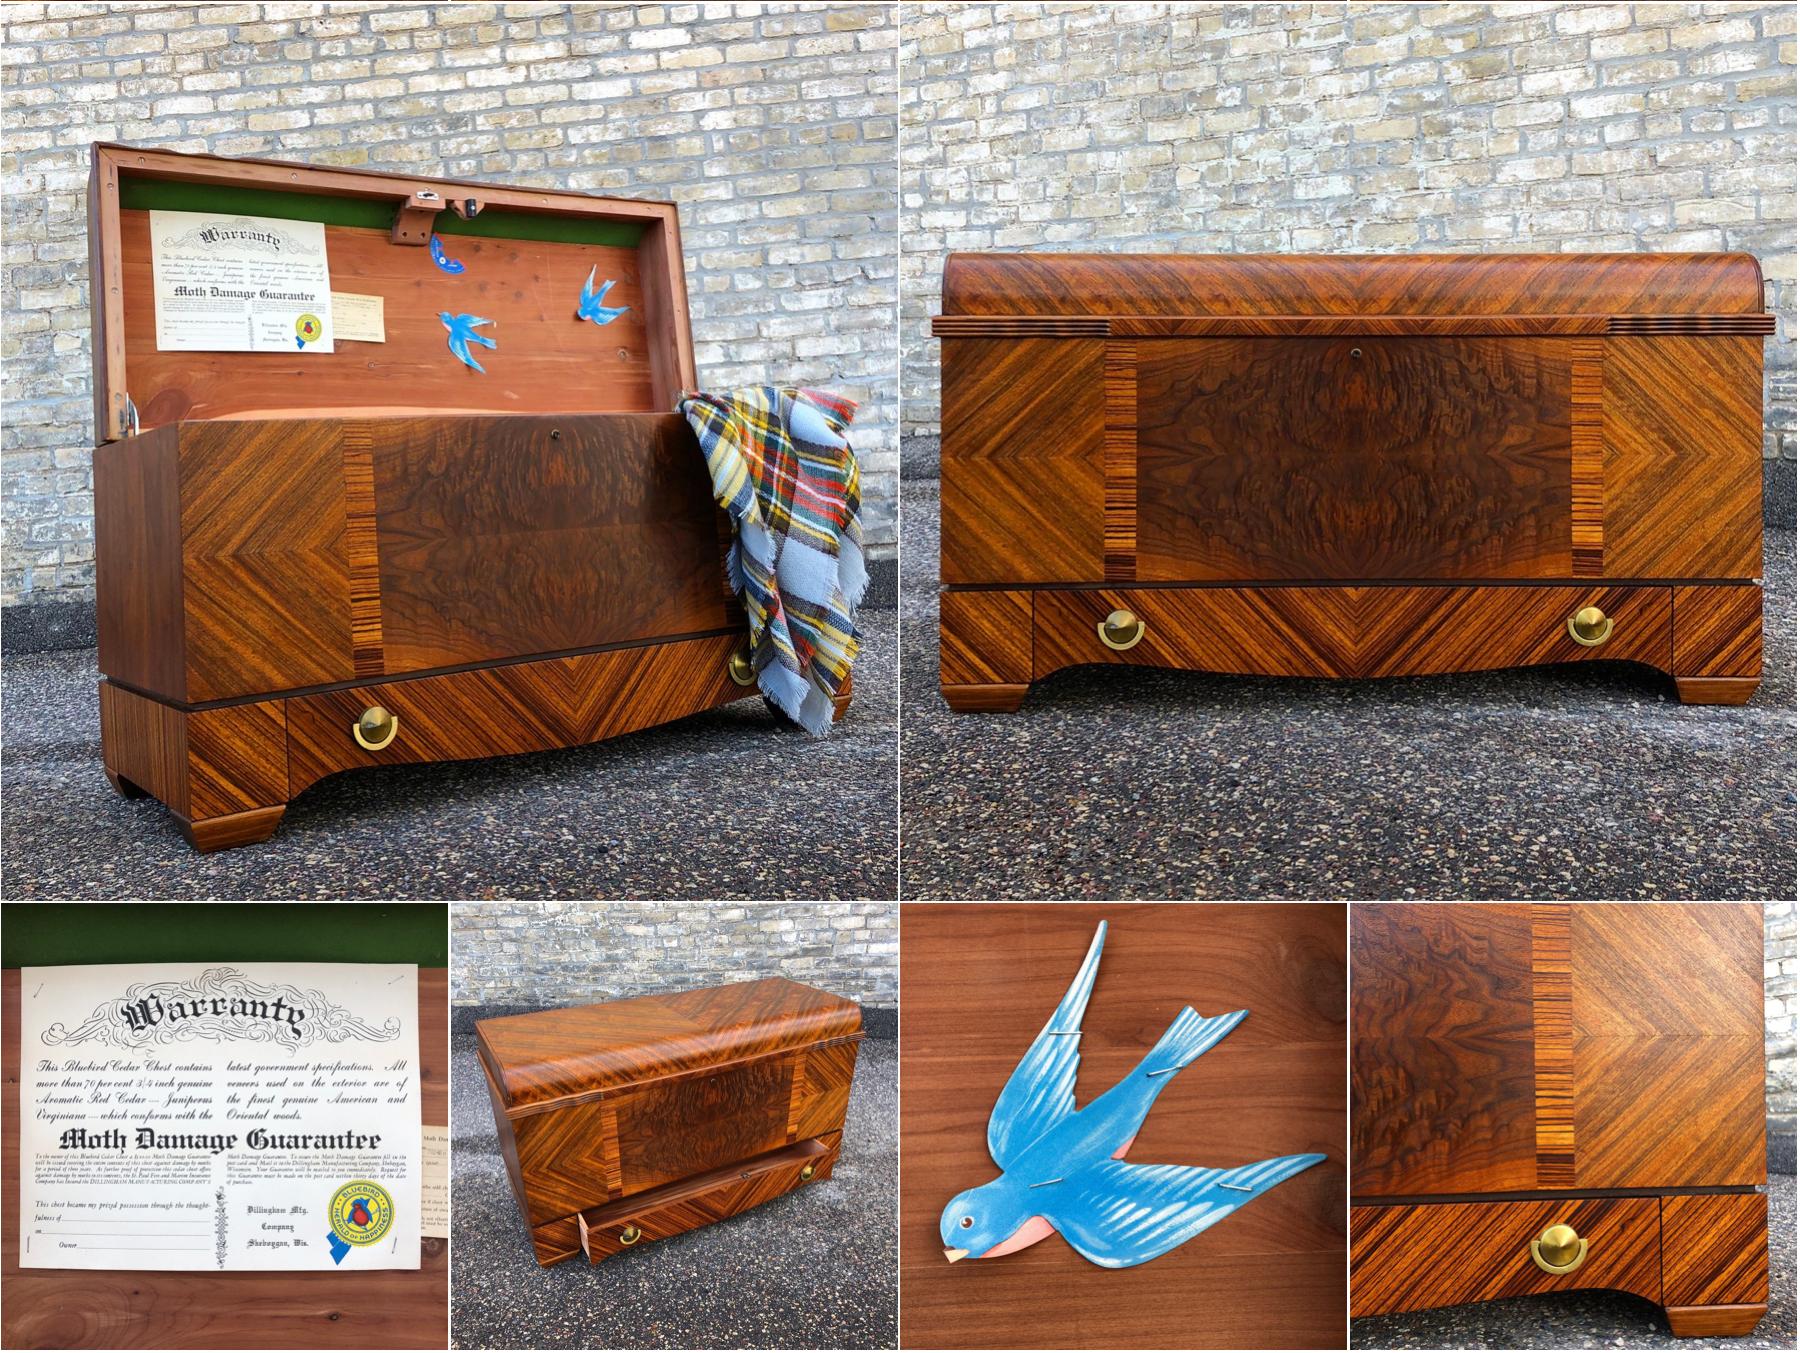 Dillingham Bluebird cedar chest – rosewood and walnut